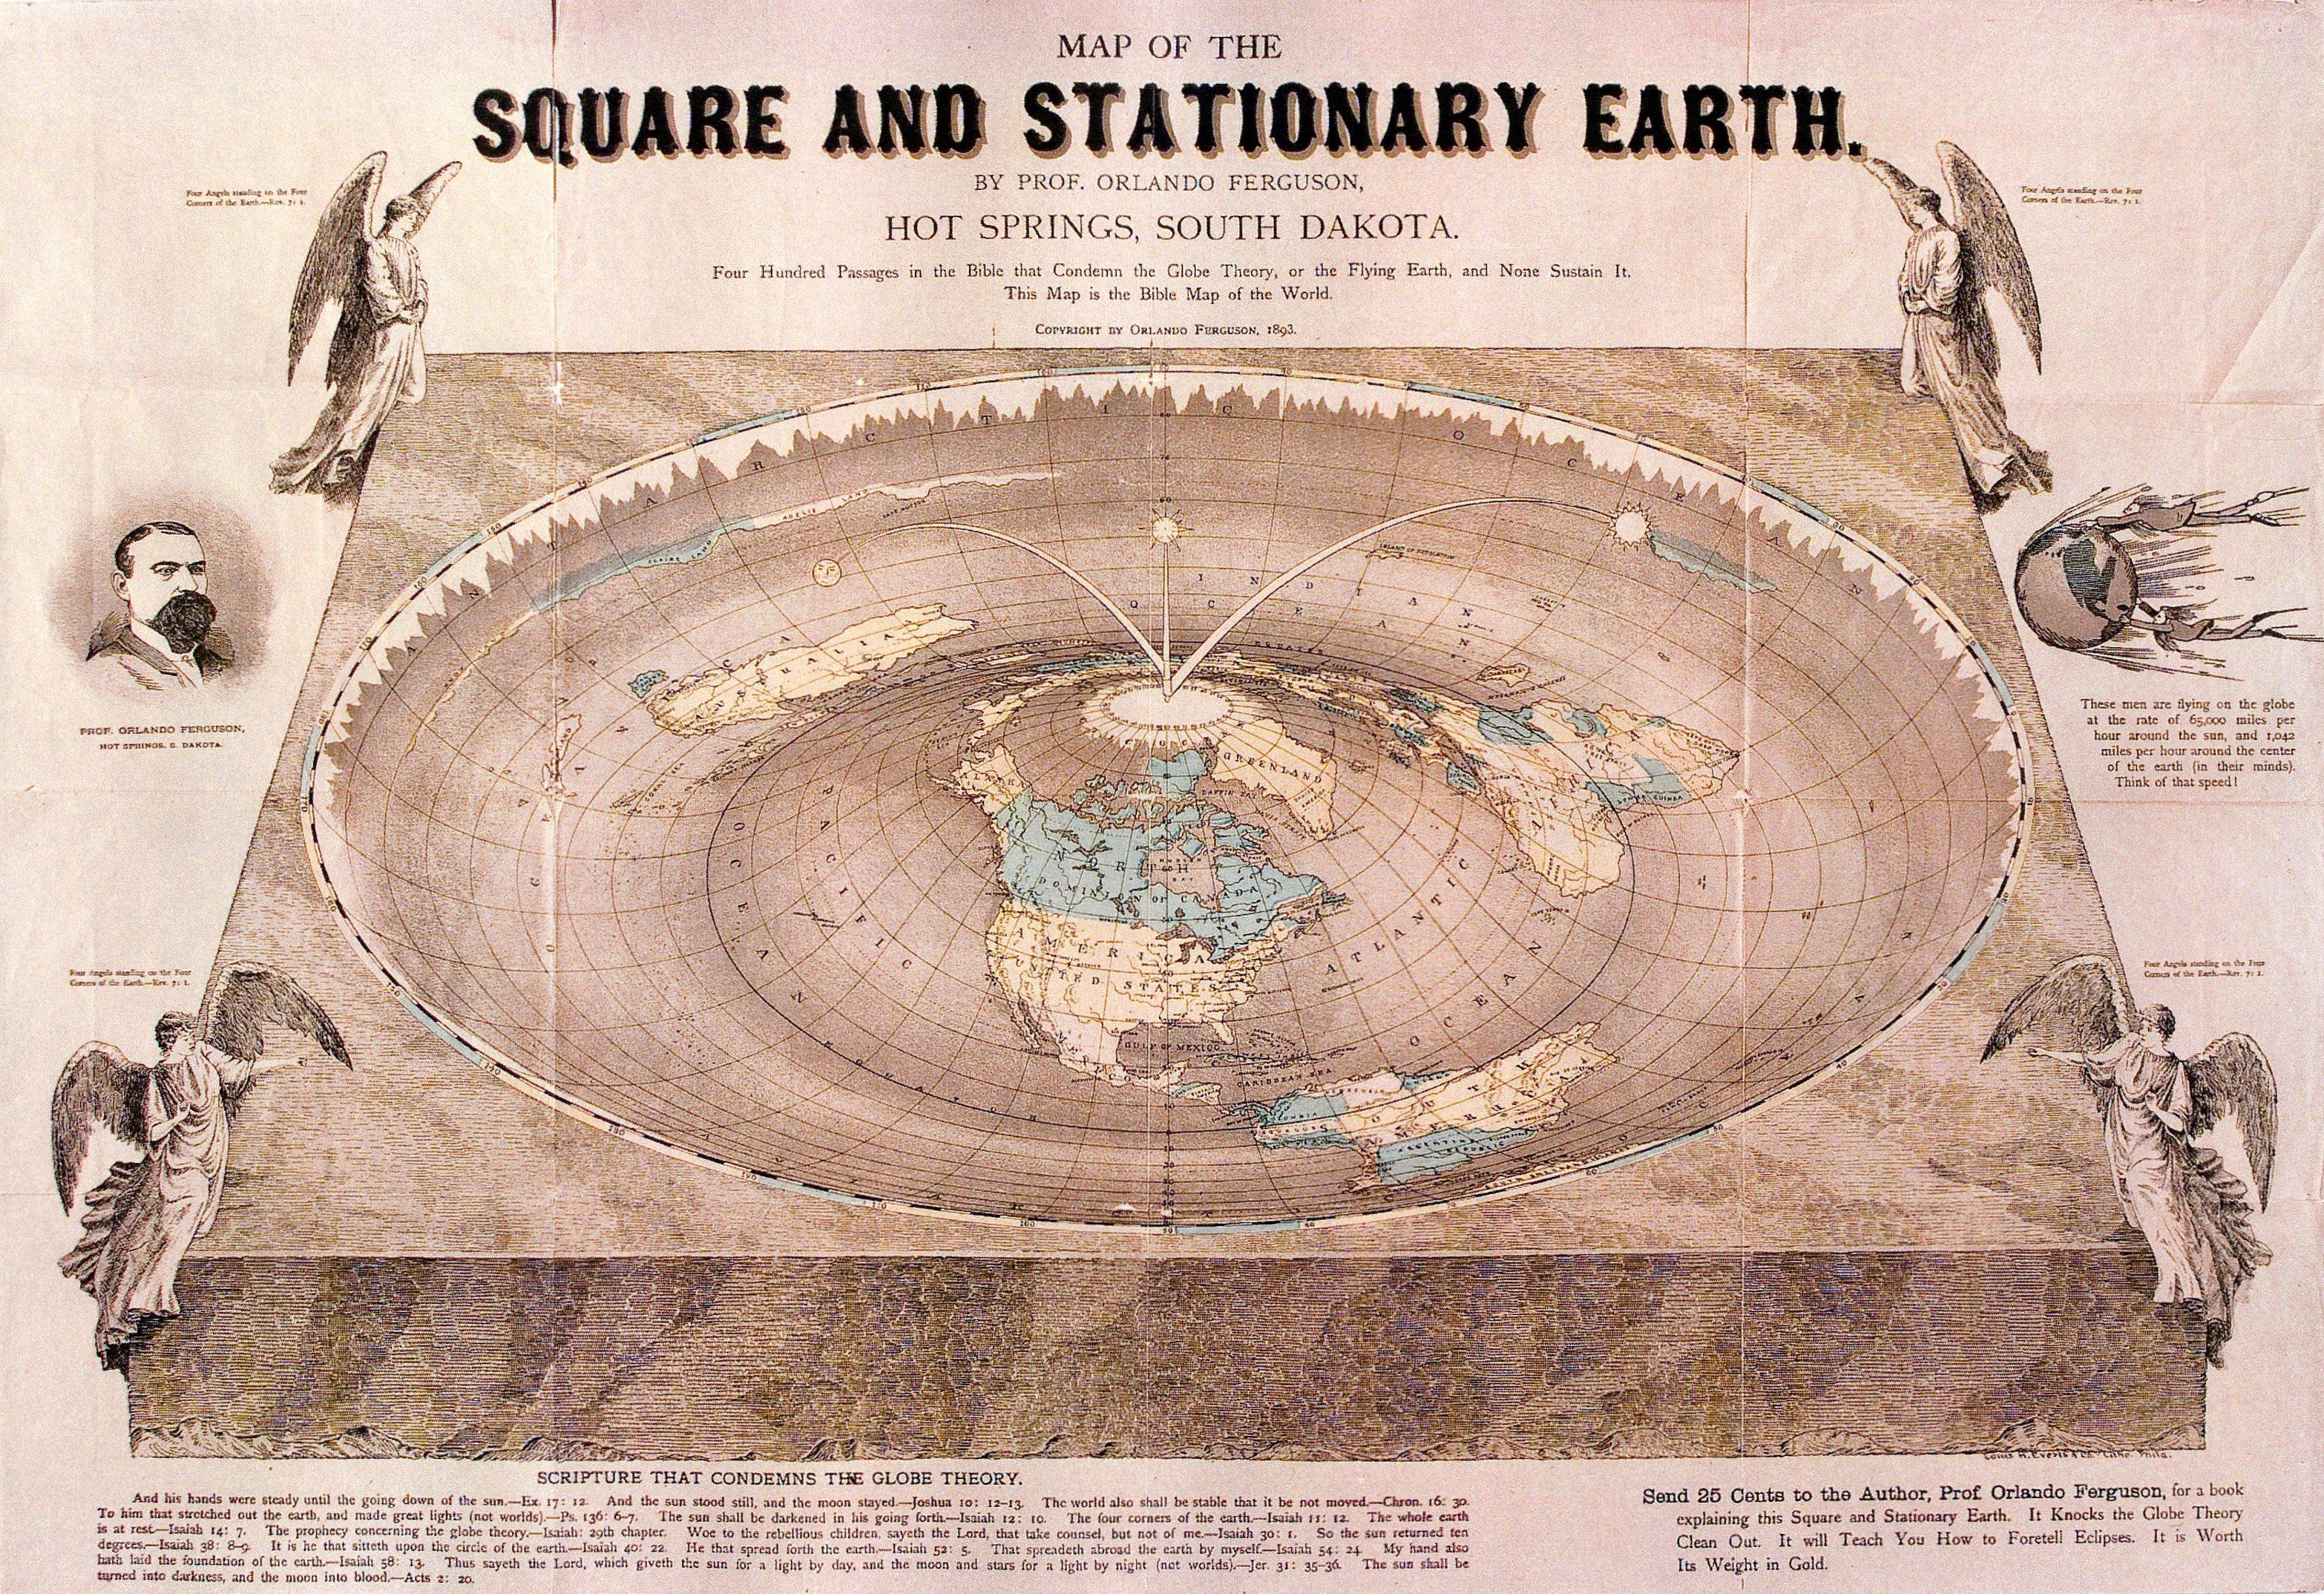 IMAGE(http://www.thehistoryblog.com/wp-content/uploads/2011/06/Orlando-Ferguson-flat-earth-map.jpg)